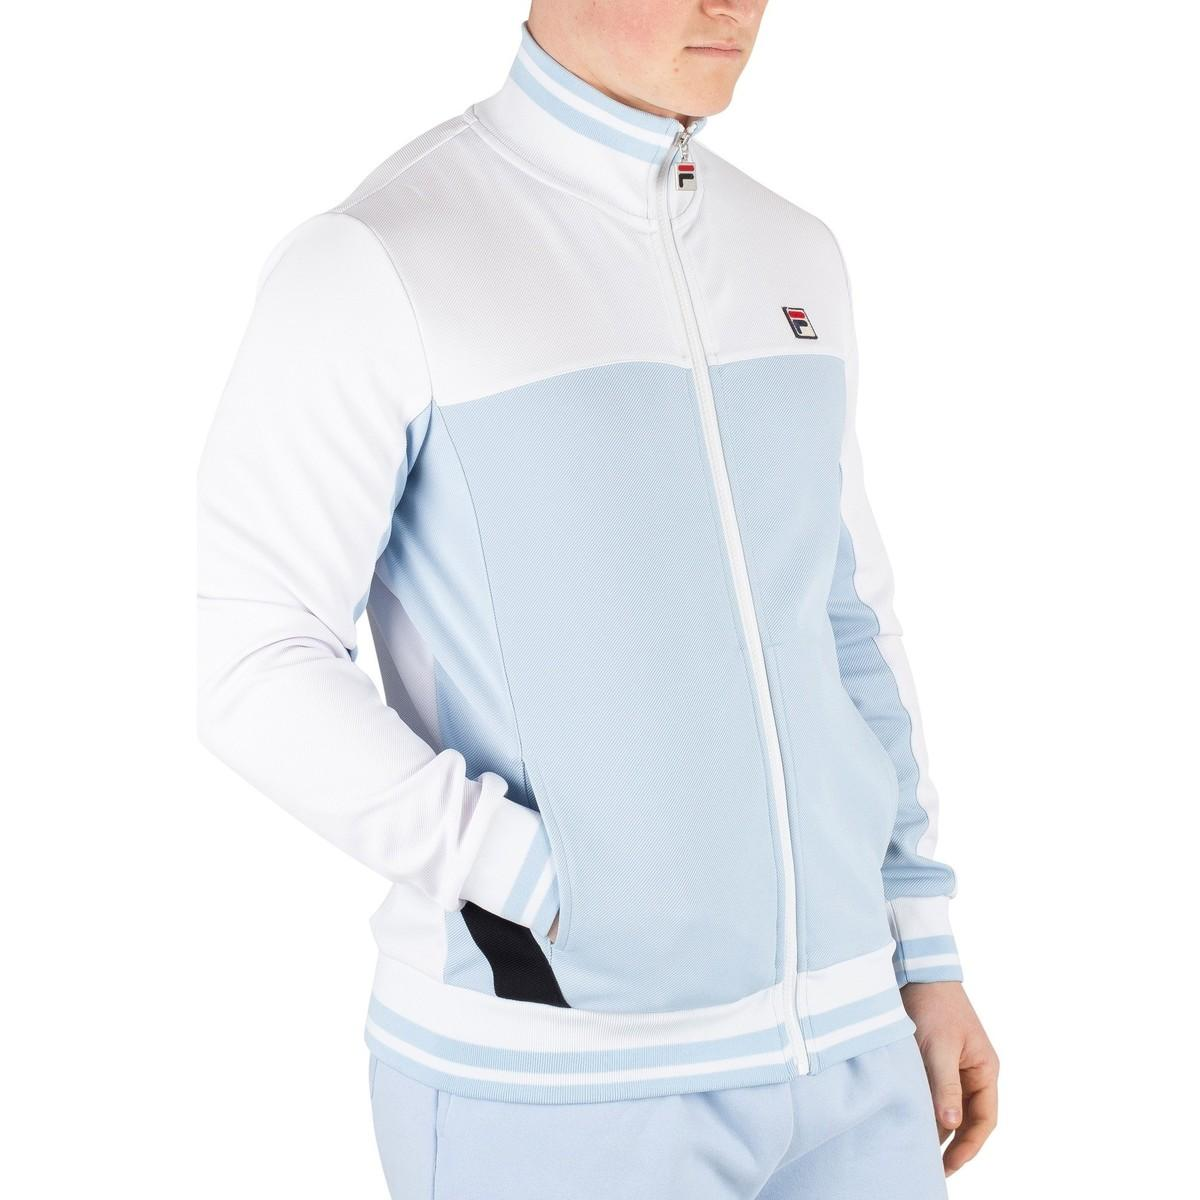 40fe1ecb Fila - Men's Tiebreaker Funnel Neck Track Jacket, Blue Men's Jacket In Blue  for Men. View fullscreen